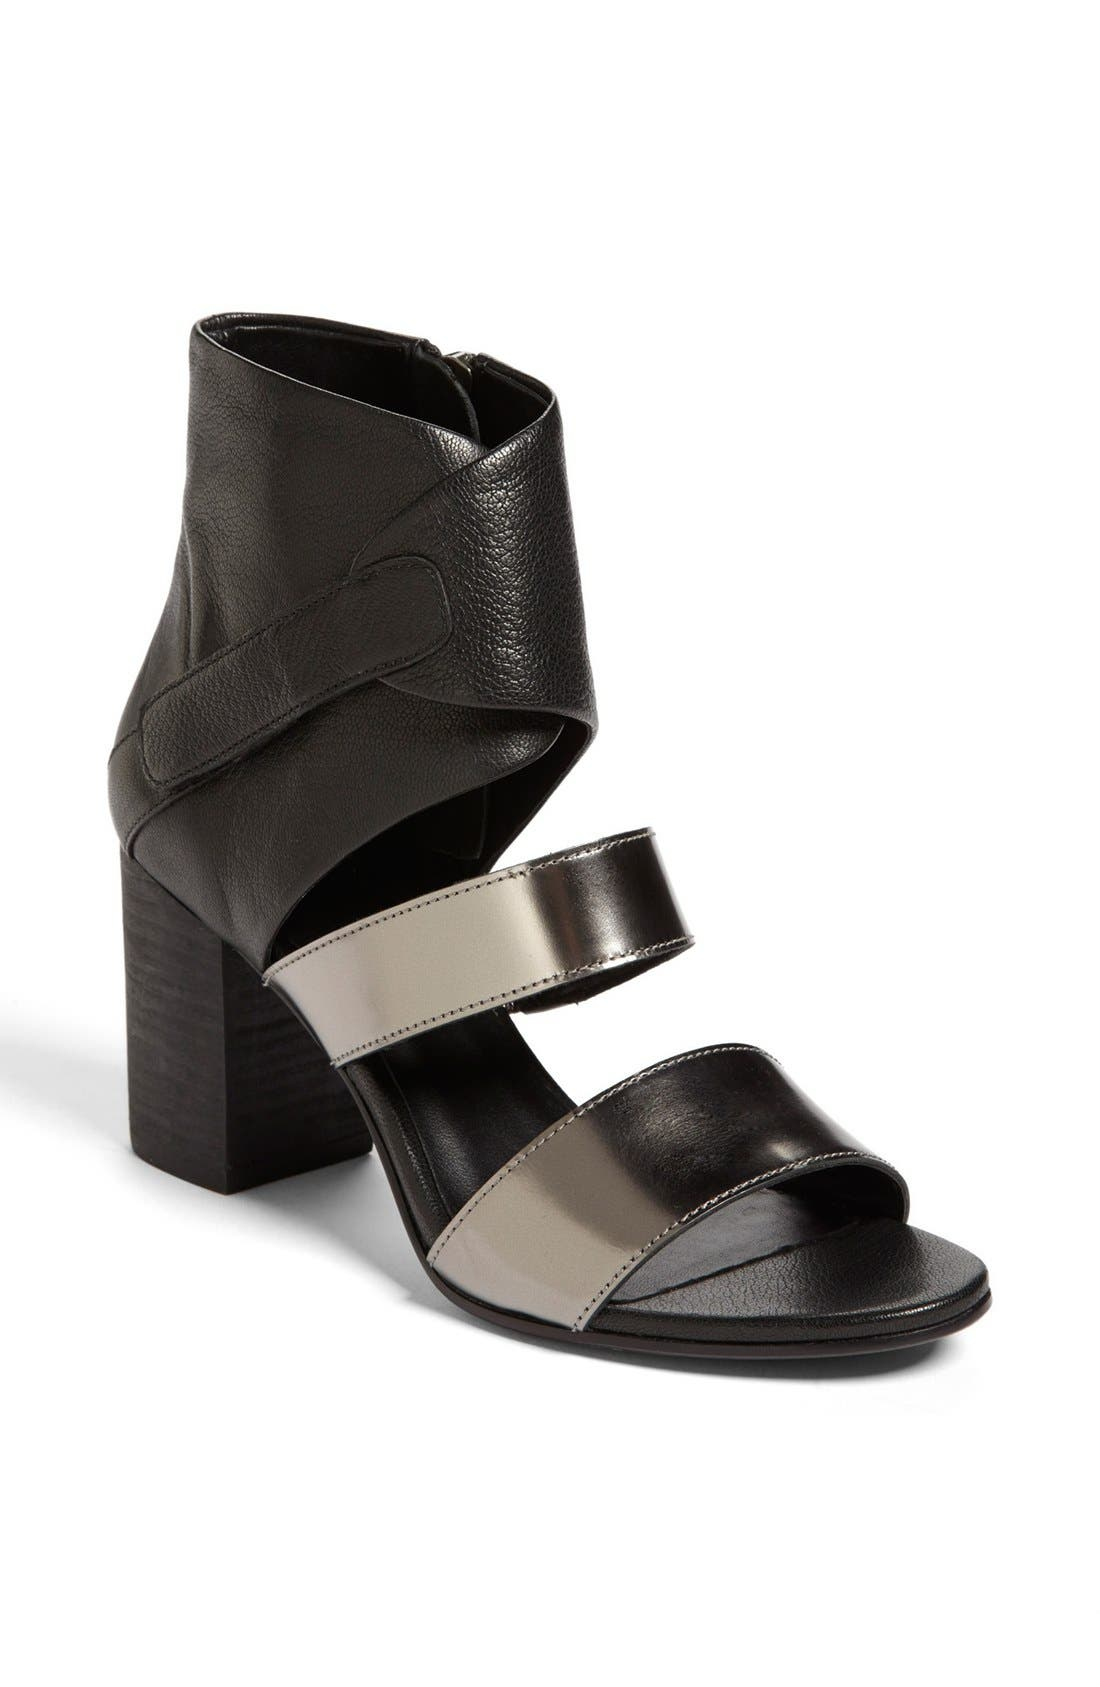 Alternate Image 1 Selected - Eileen Fisher 'Tier' Sandal